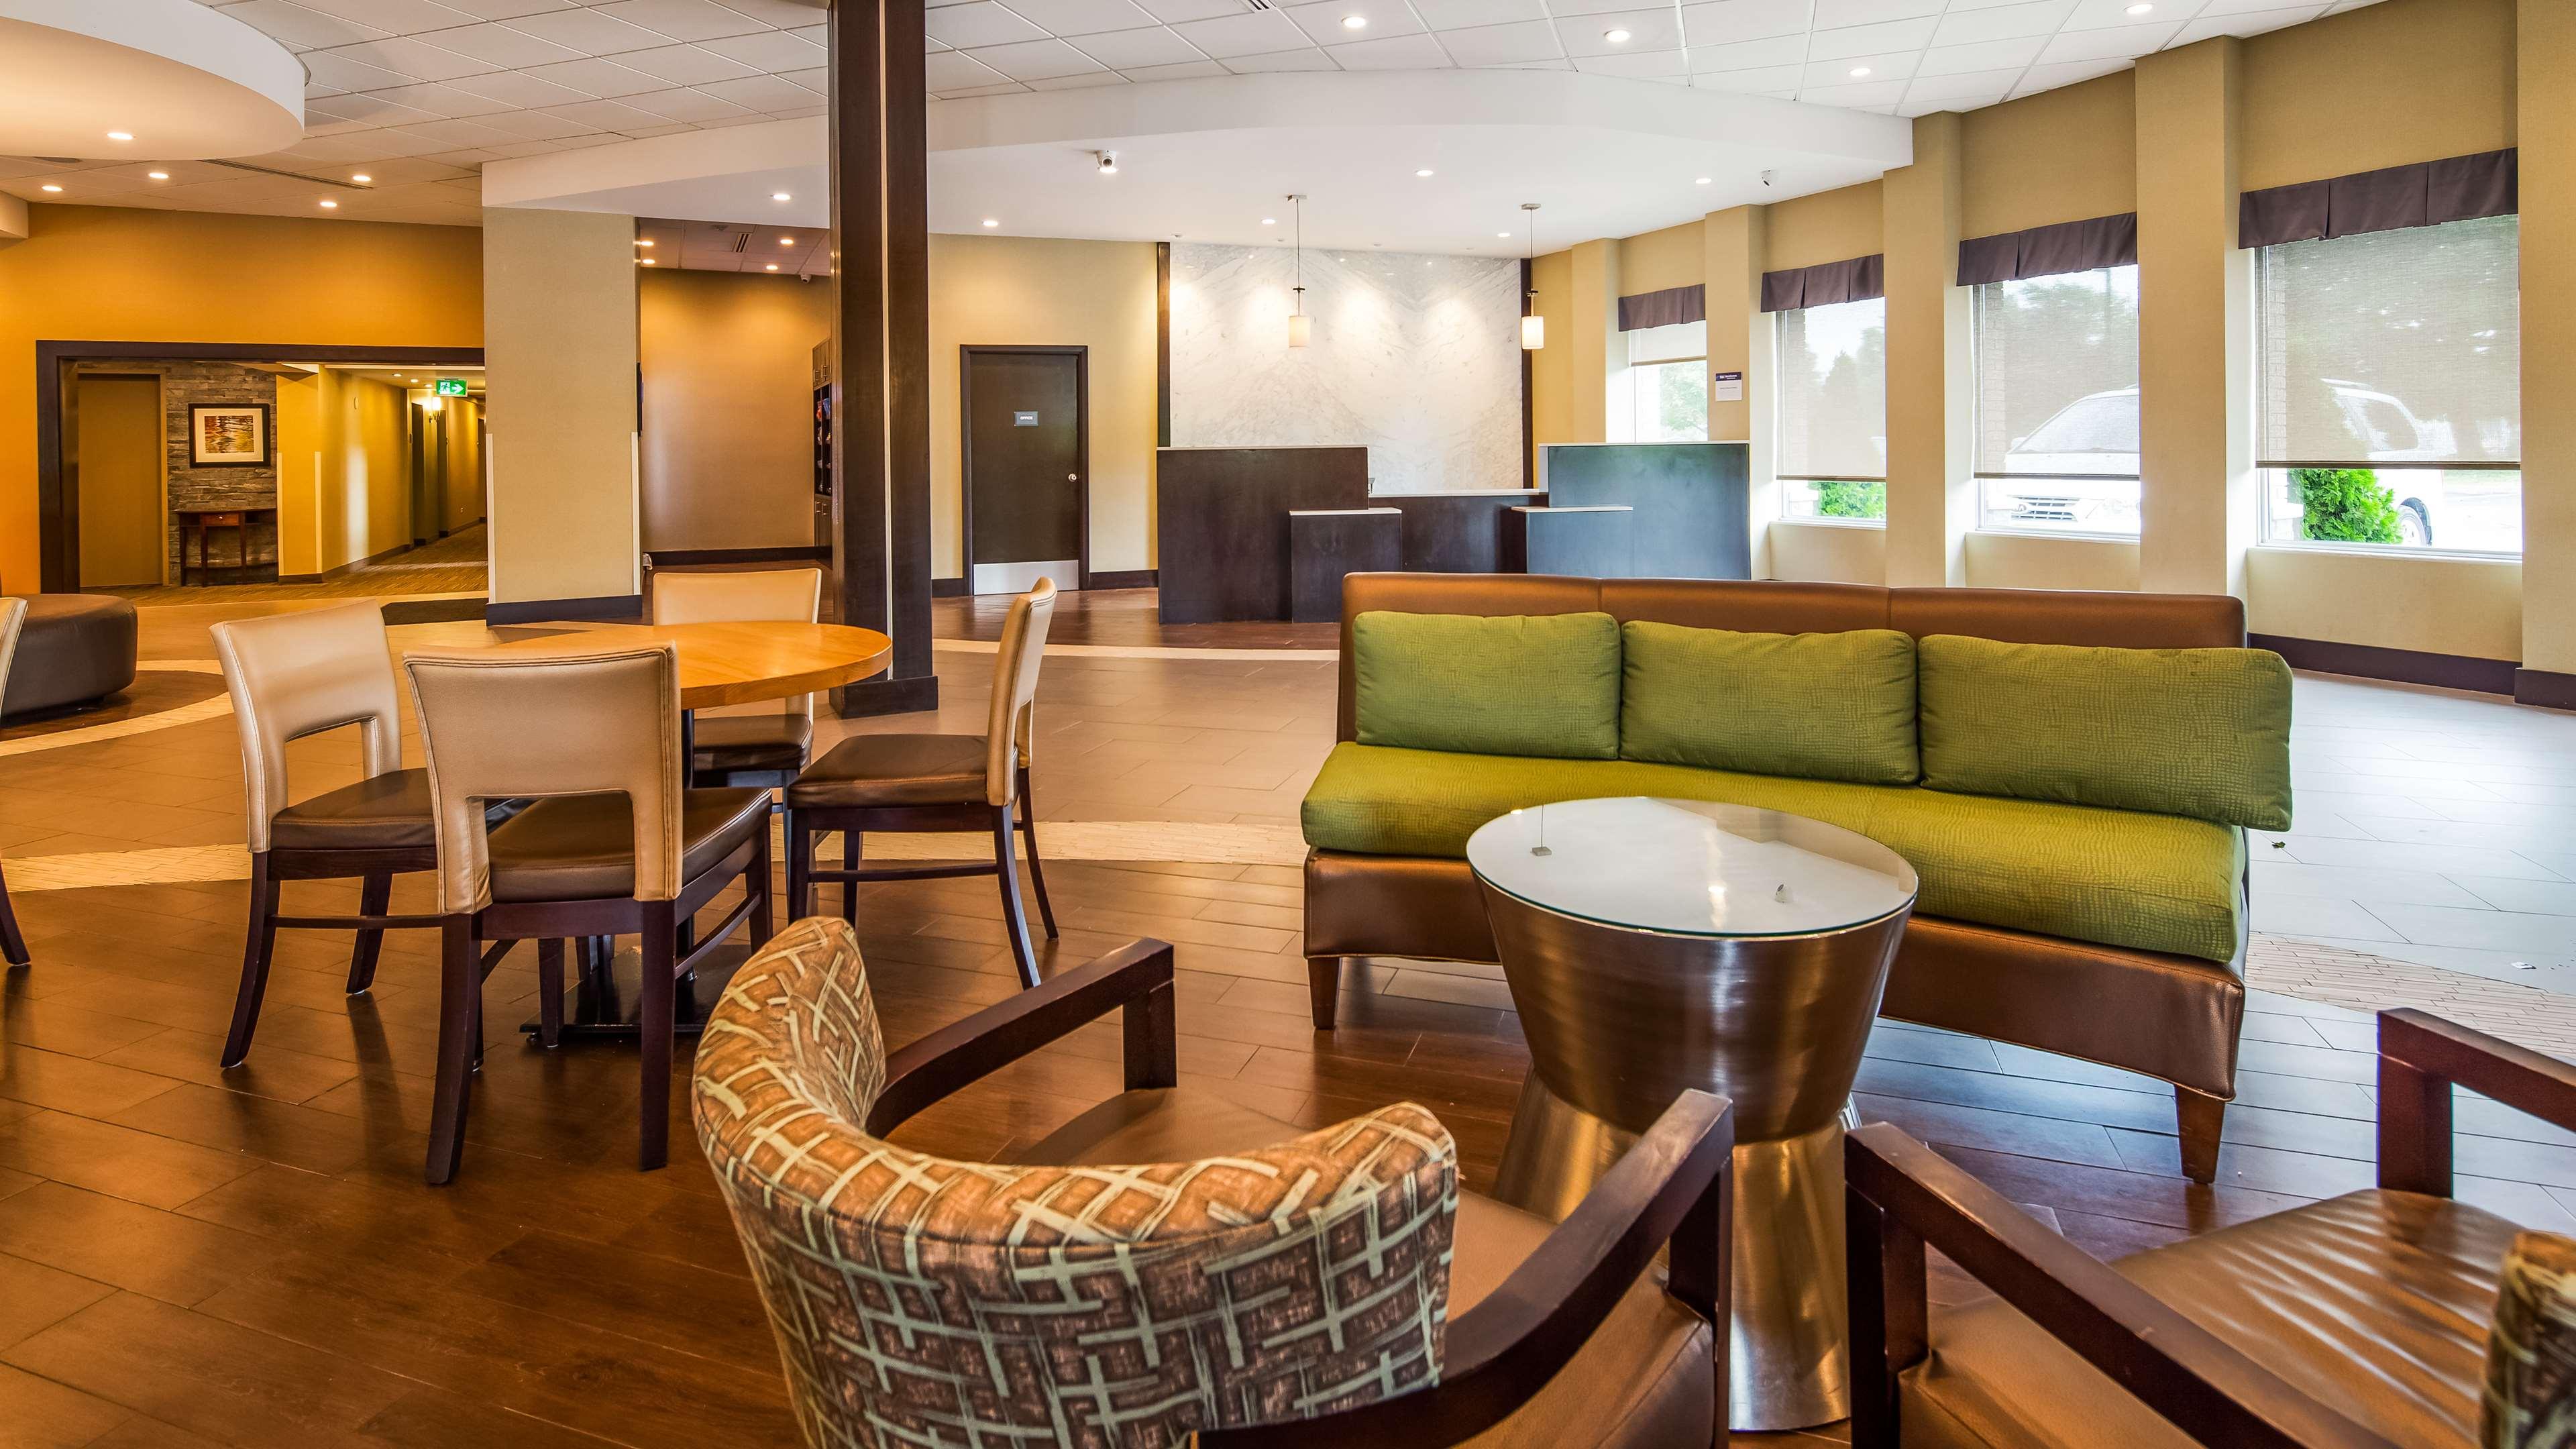 Hotel Lobby Best Western Plus Leamington Hotel & Conference Centre Leamington (519)326-8646